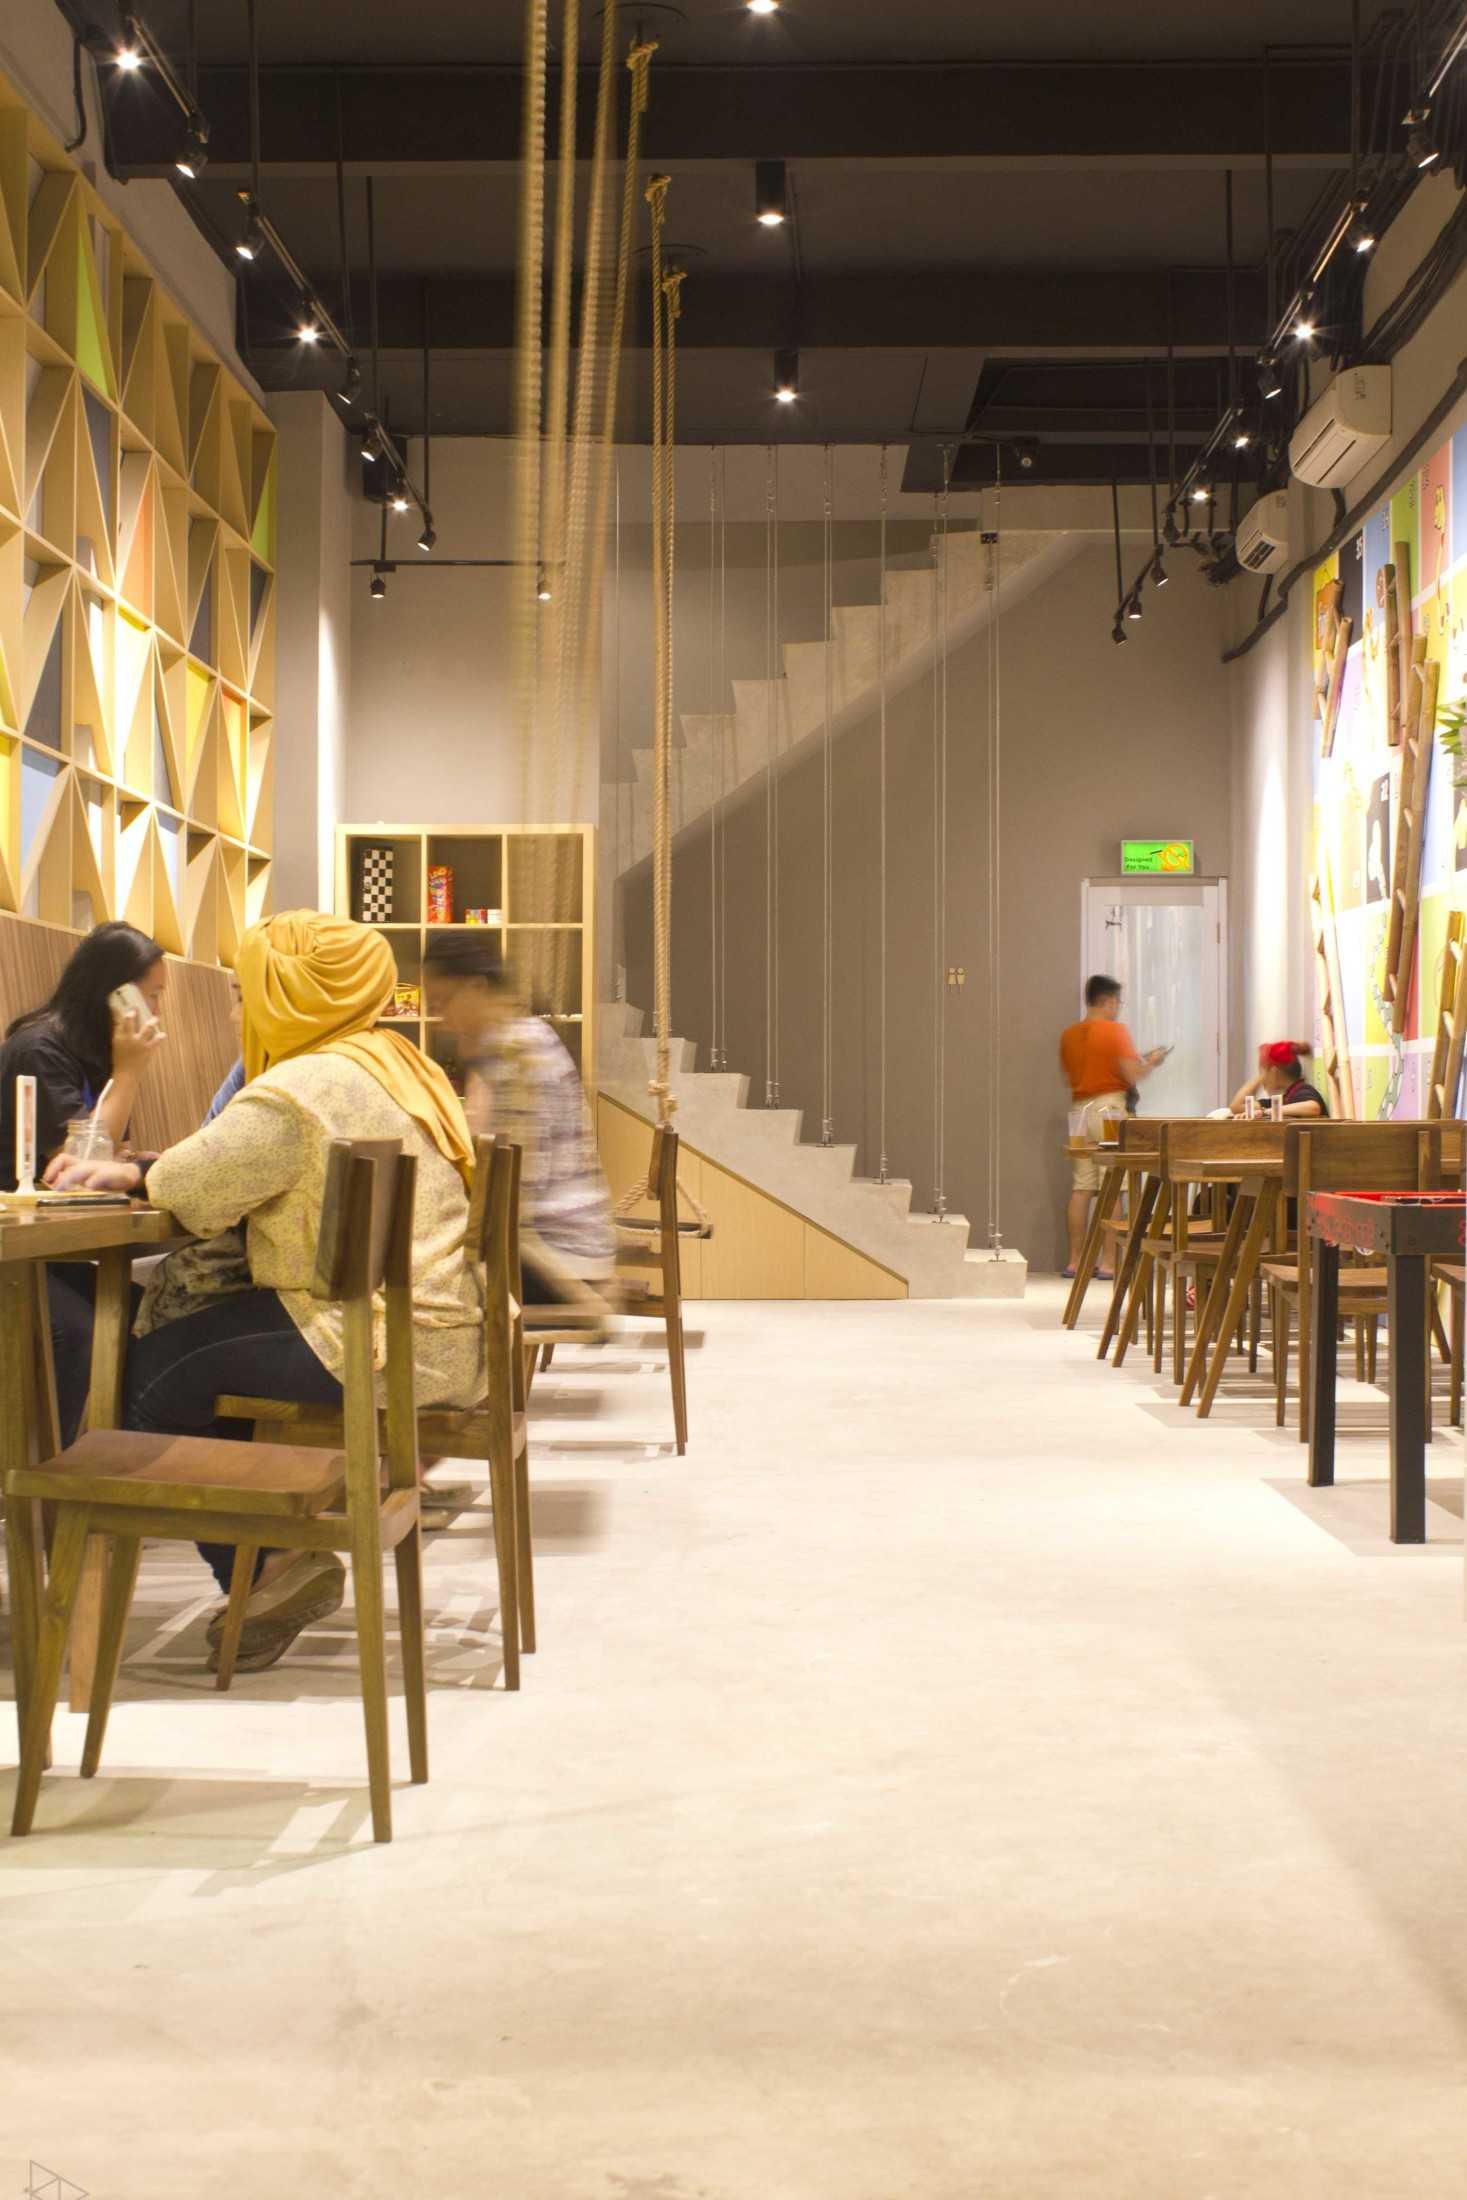 Ties Design & Build 90'S Flazback Cafe Klp. Indah, Kec. Tangerang, Kota Tangerang, Banten, Indonesia Klp. Indah, Kec. Tangerang, Kota Tangerang, Banten, Indonesia Eating Area- 1St Floor  68651